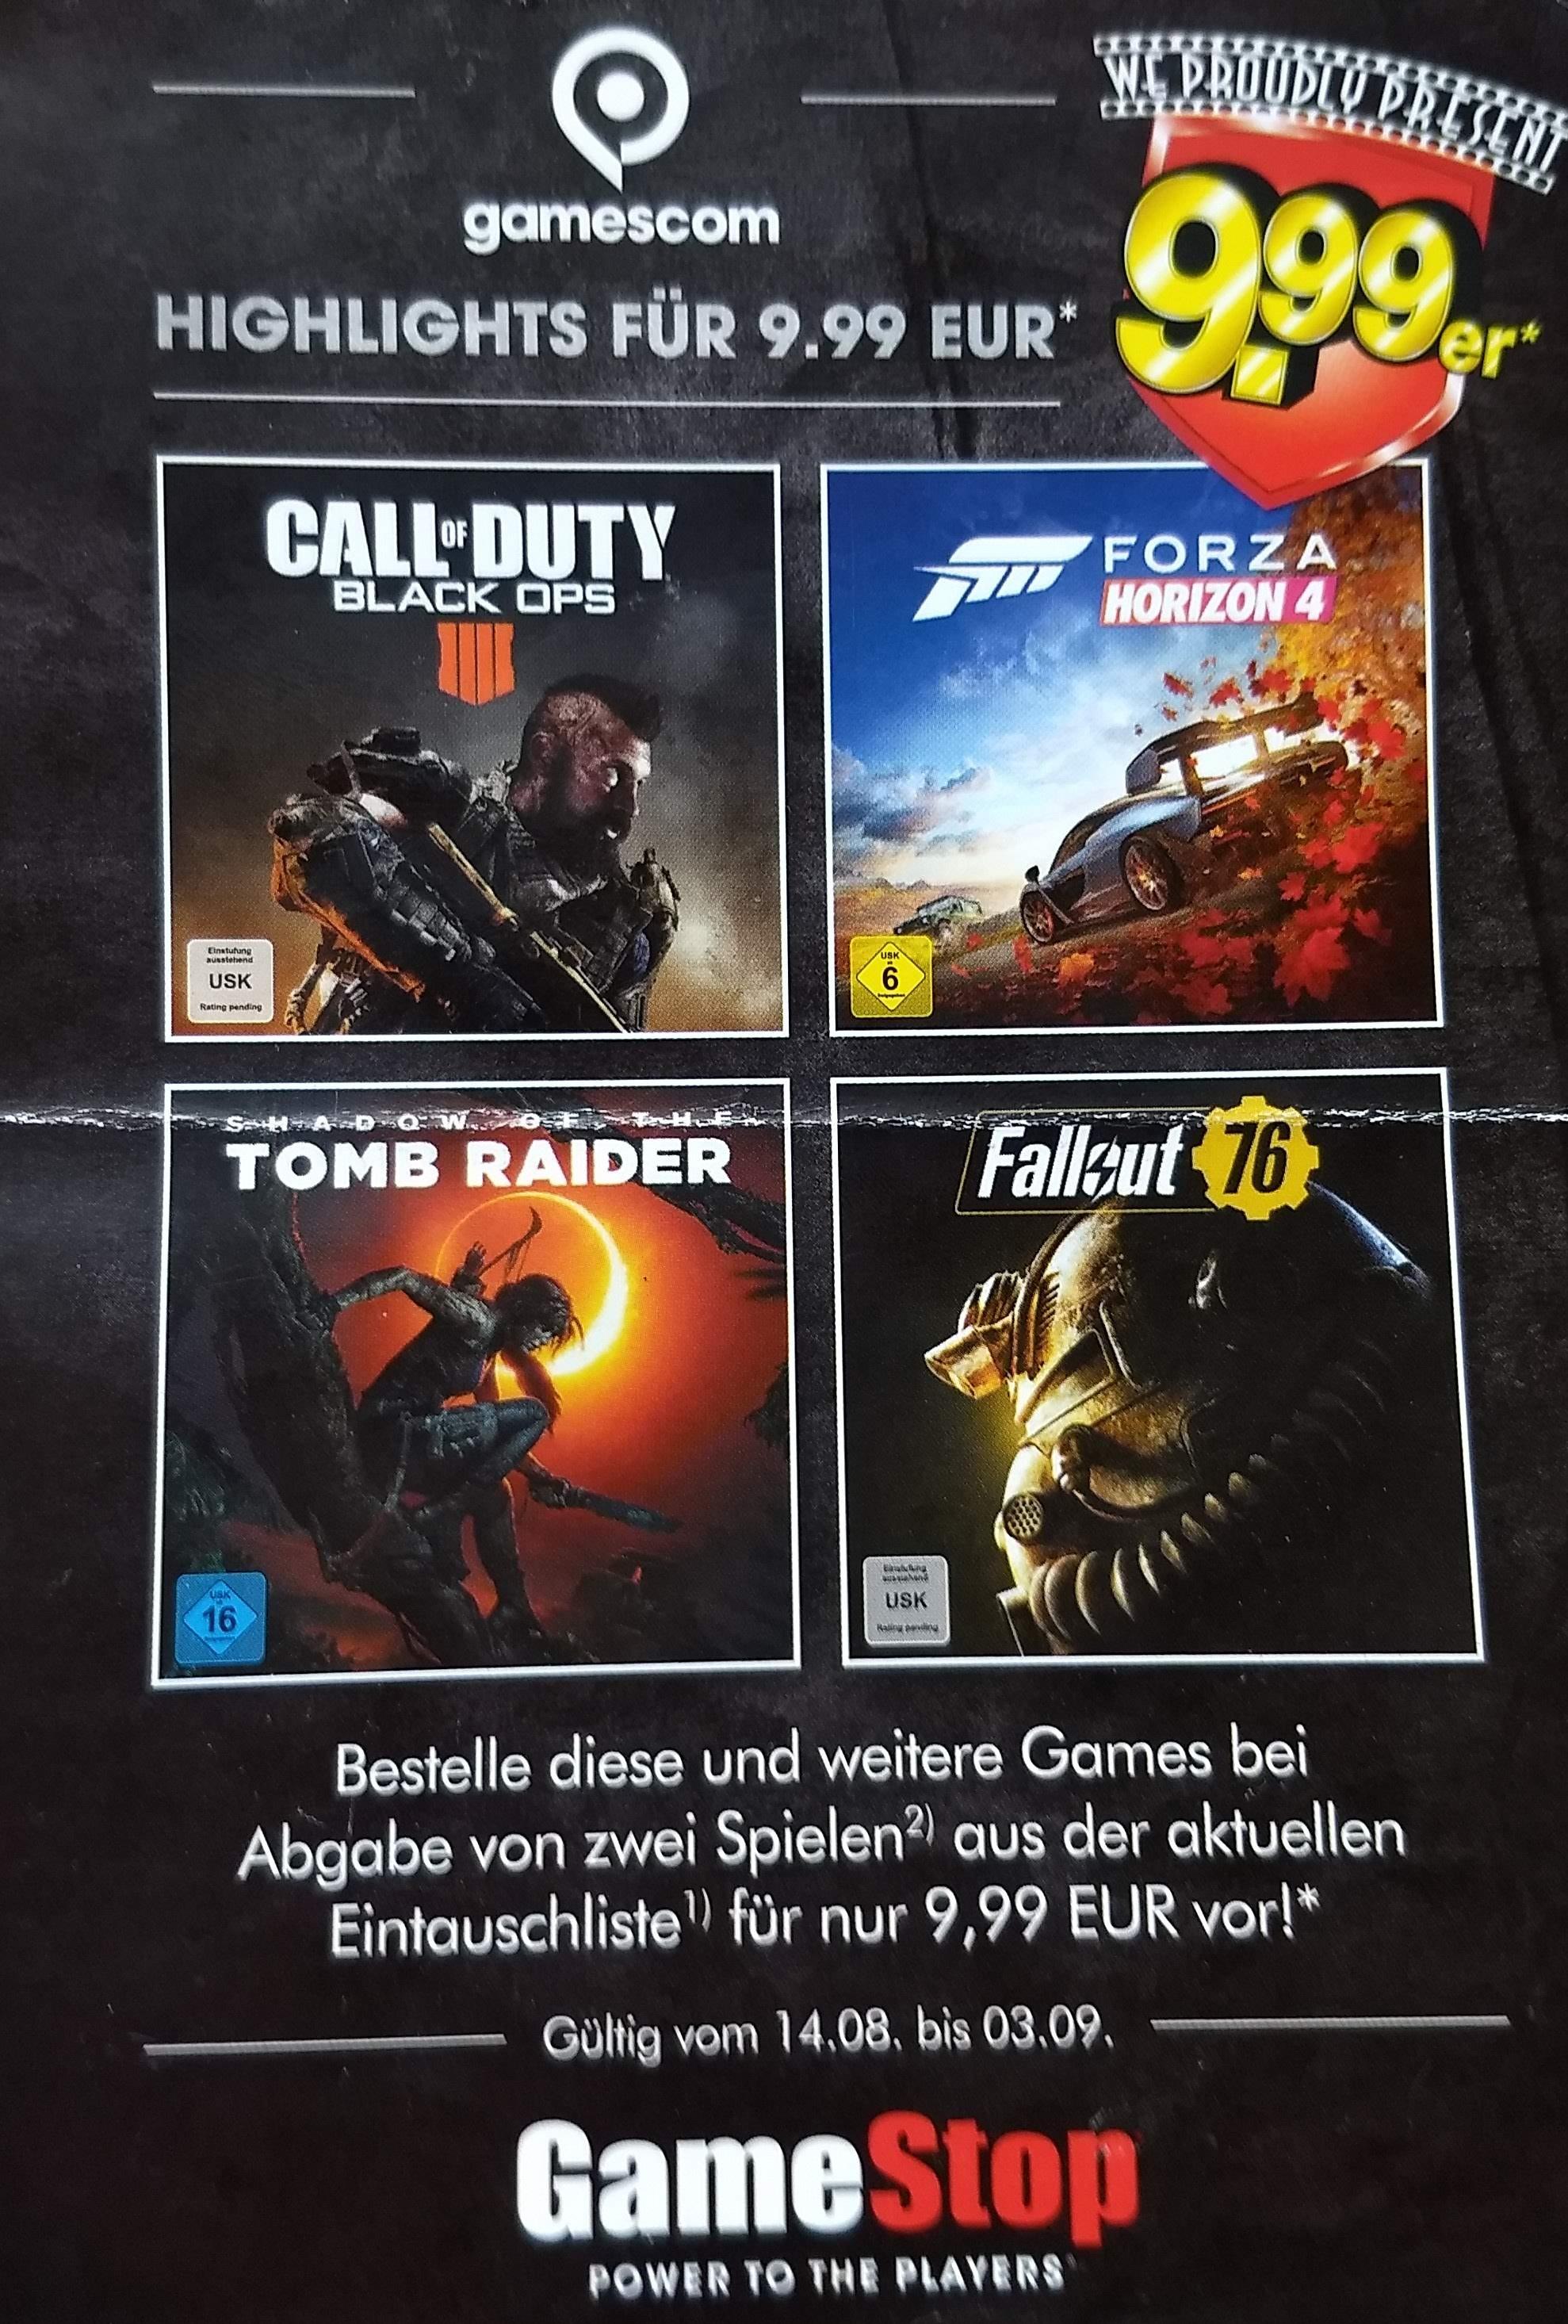 GamesCom 9.99er Gamestop Aktion 2018